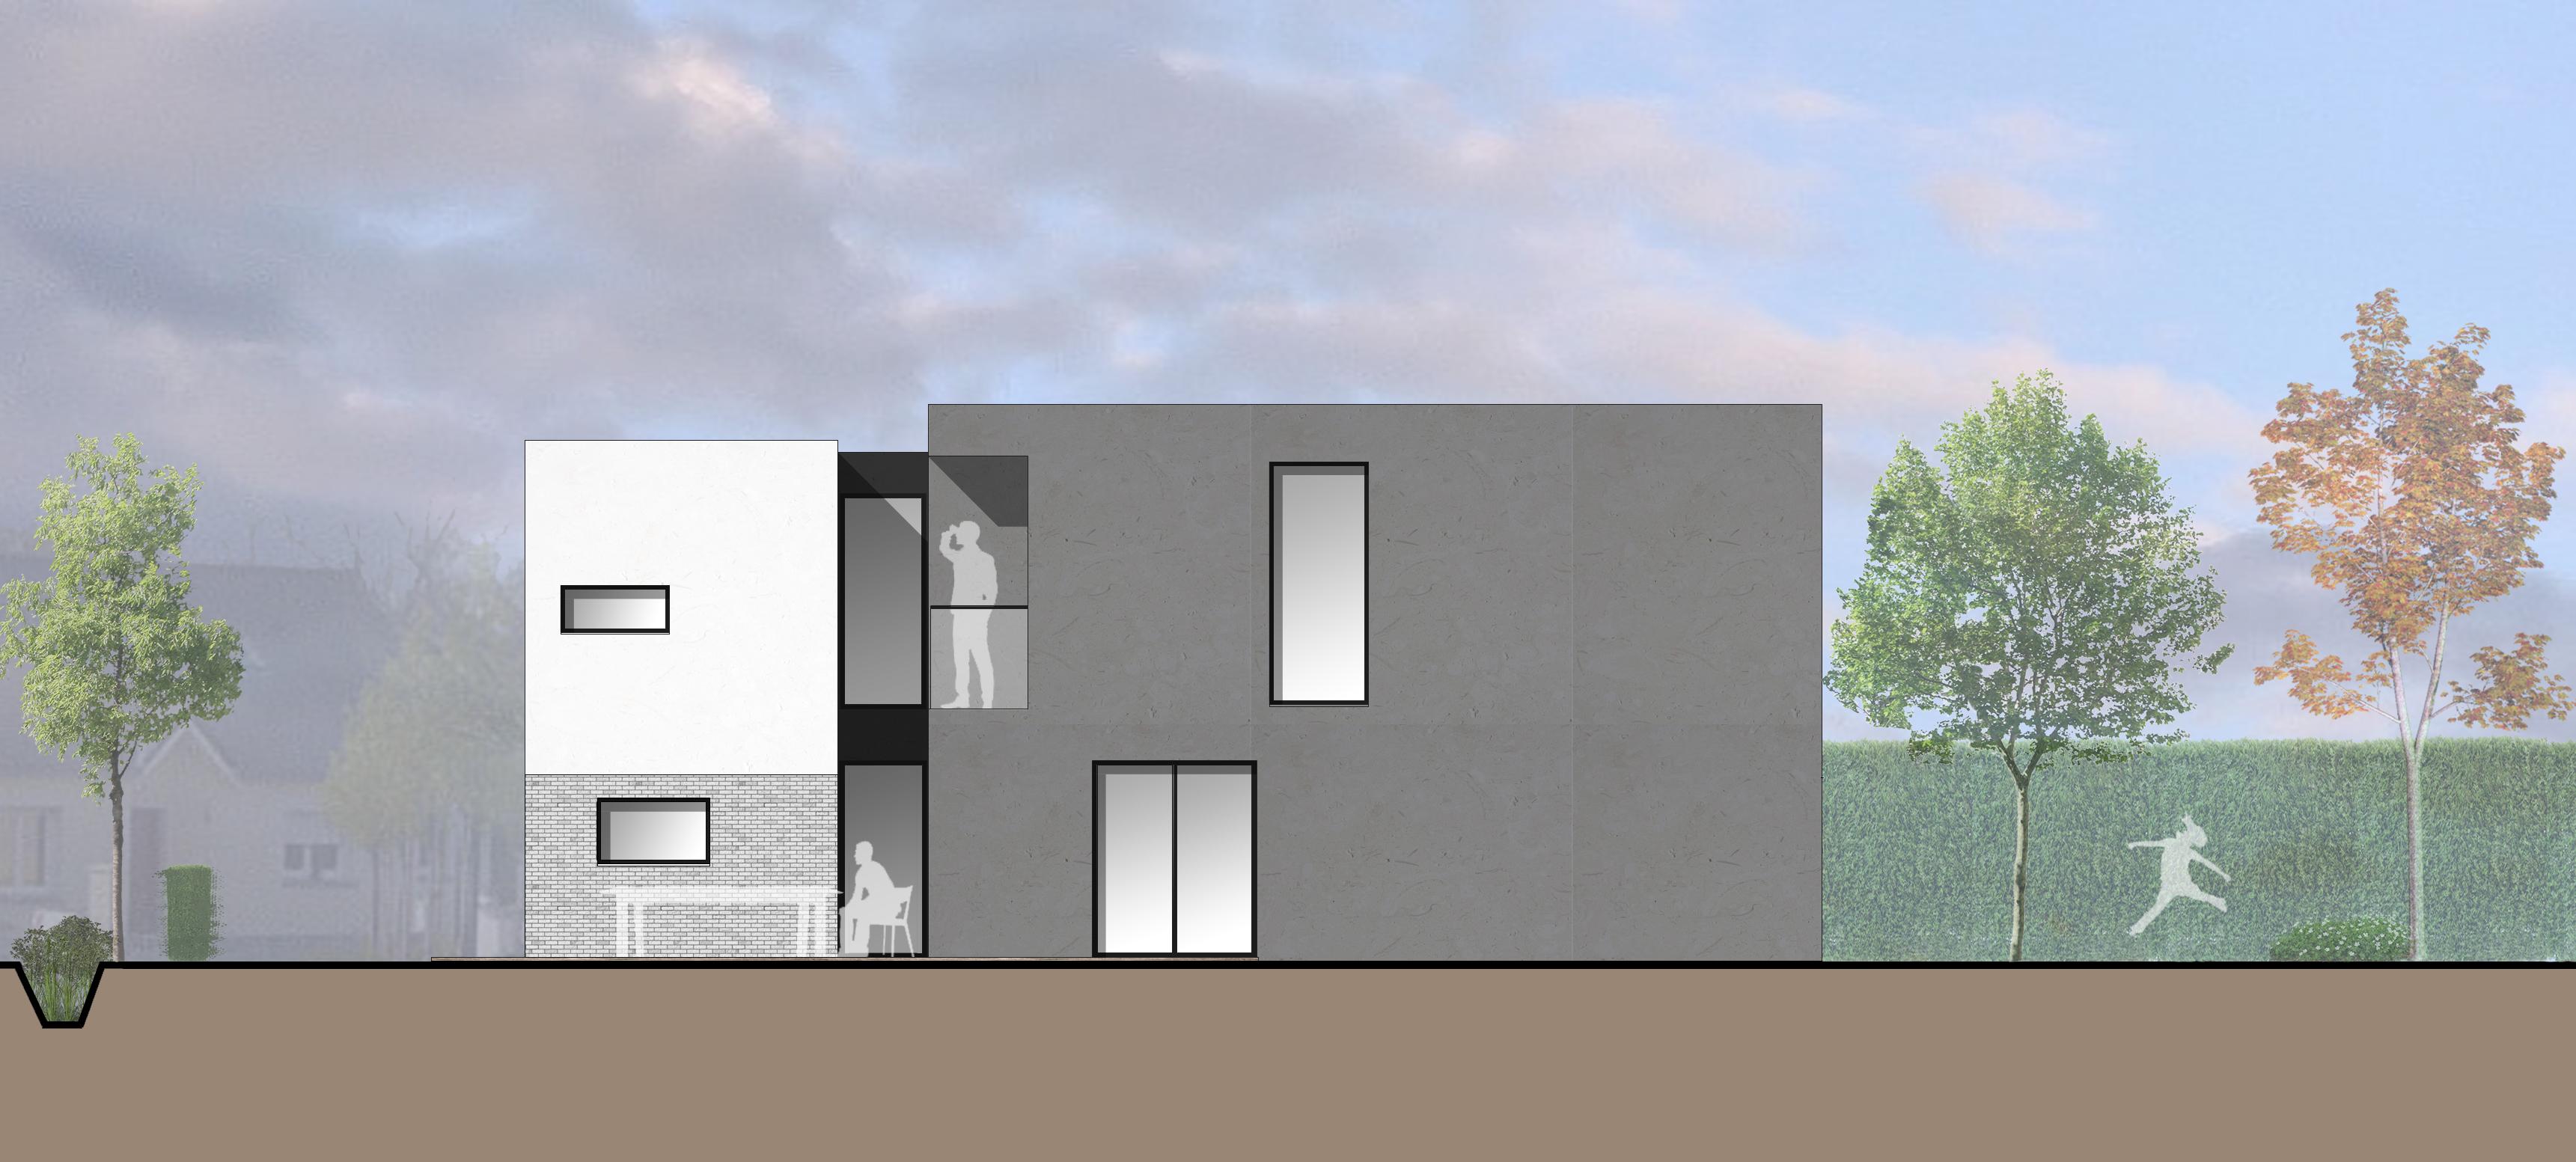 6 - Facade Projet 2